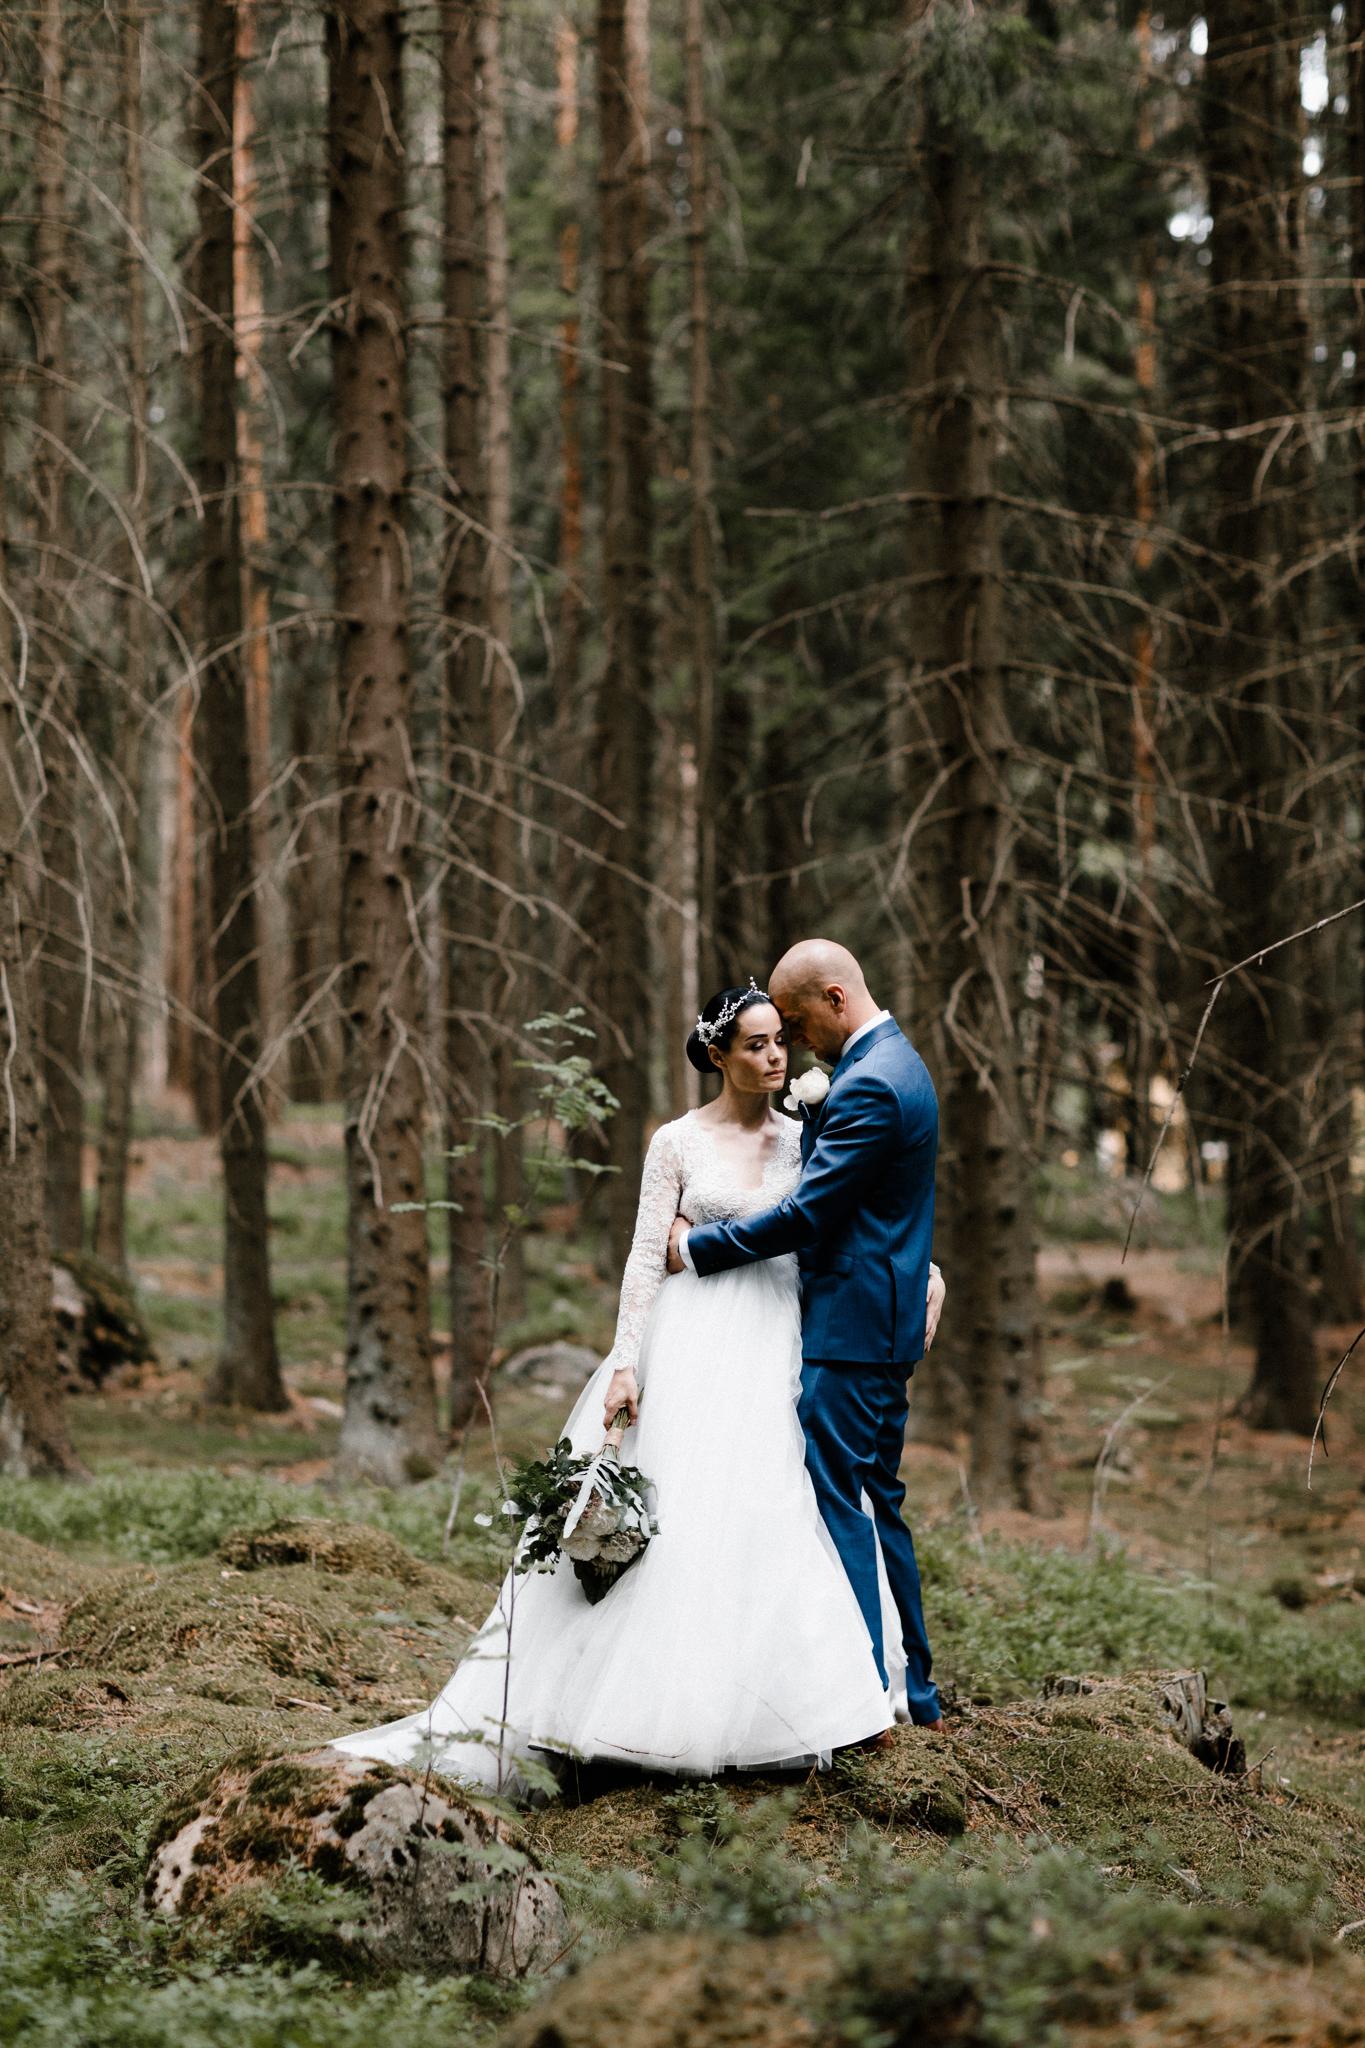 Essi + Ville   Oitbacka Gården   by Patrick Karkkolainen Wedding Photography-95.jpg